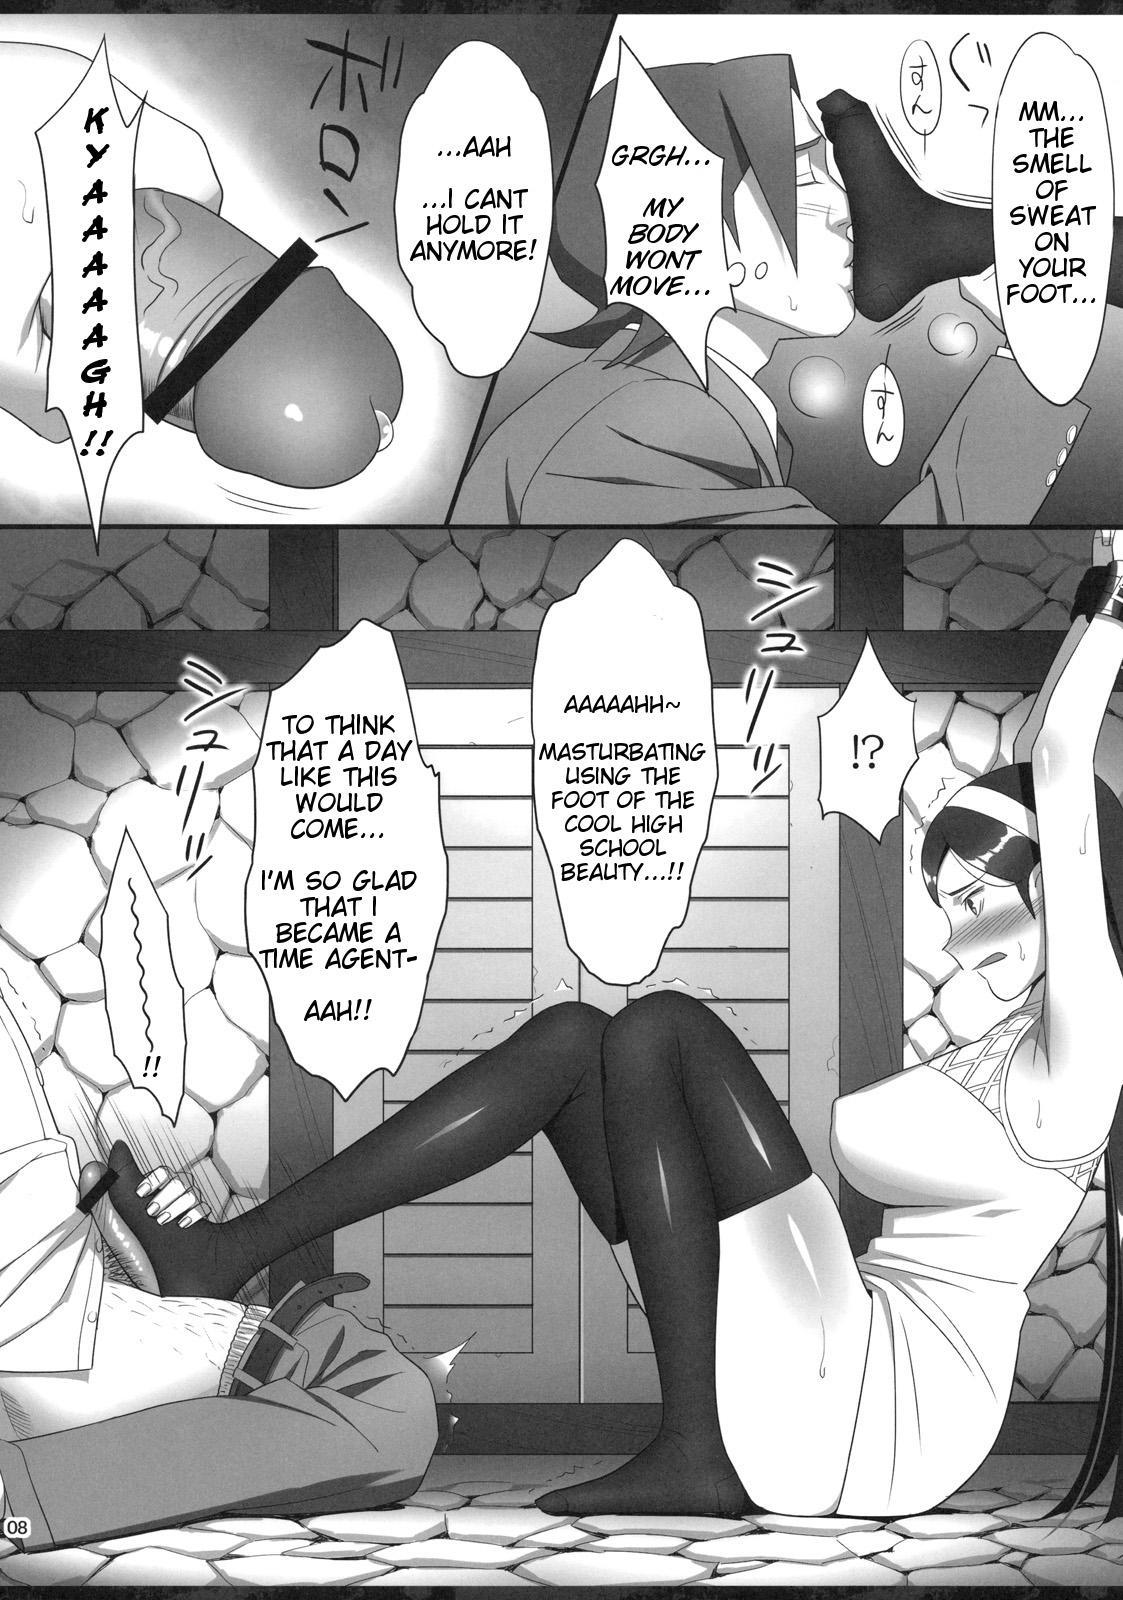 Occult Lover Girl no Junan | Occult Lover Girl's Suffering 6